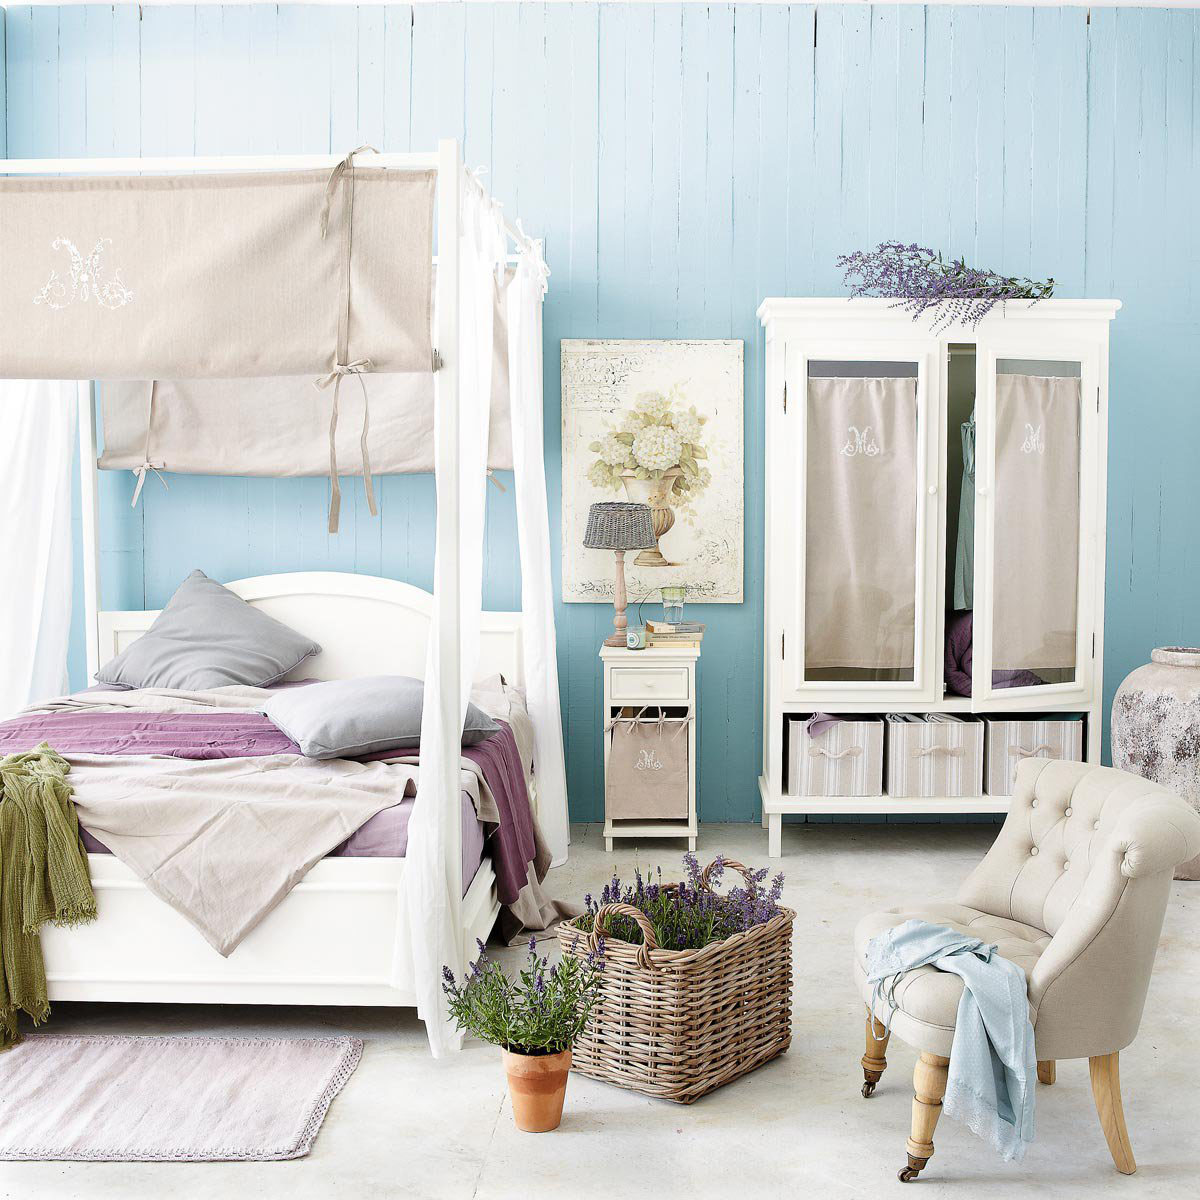 Dormitorios - camas con dosel